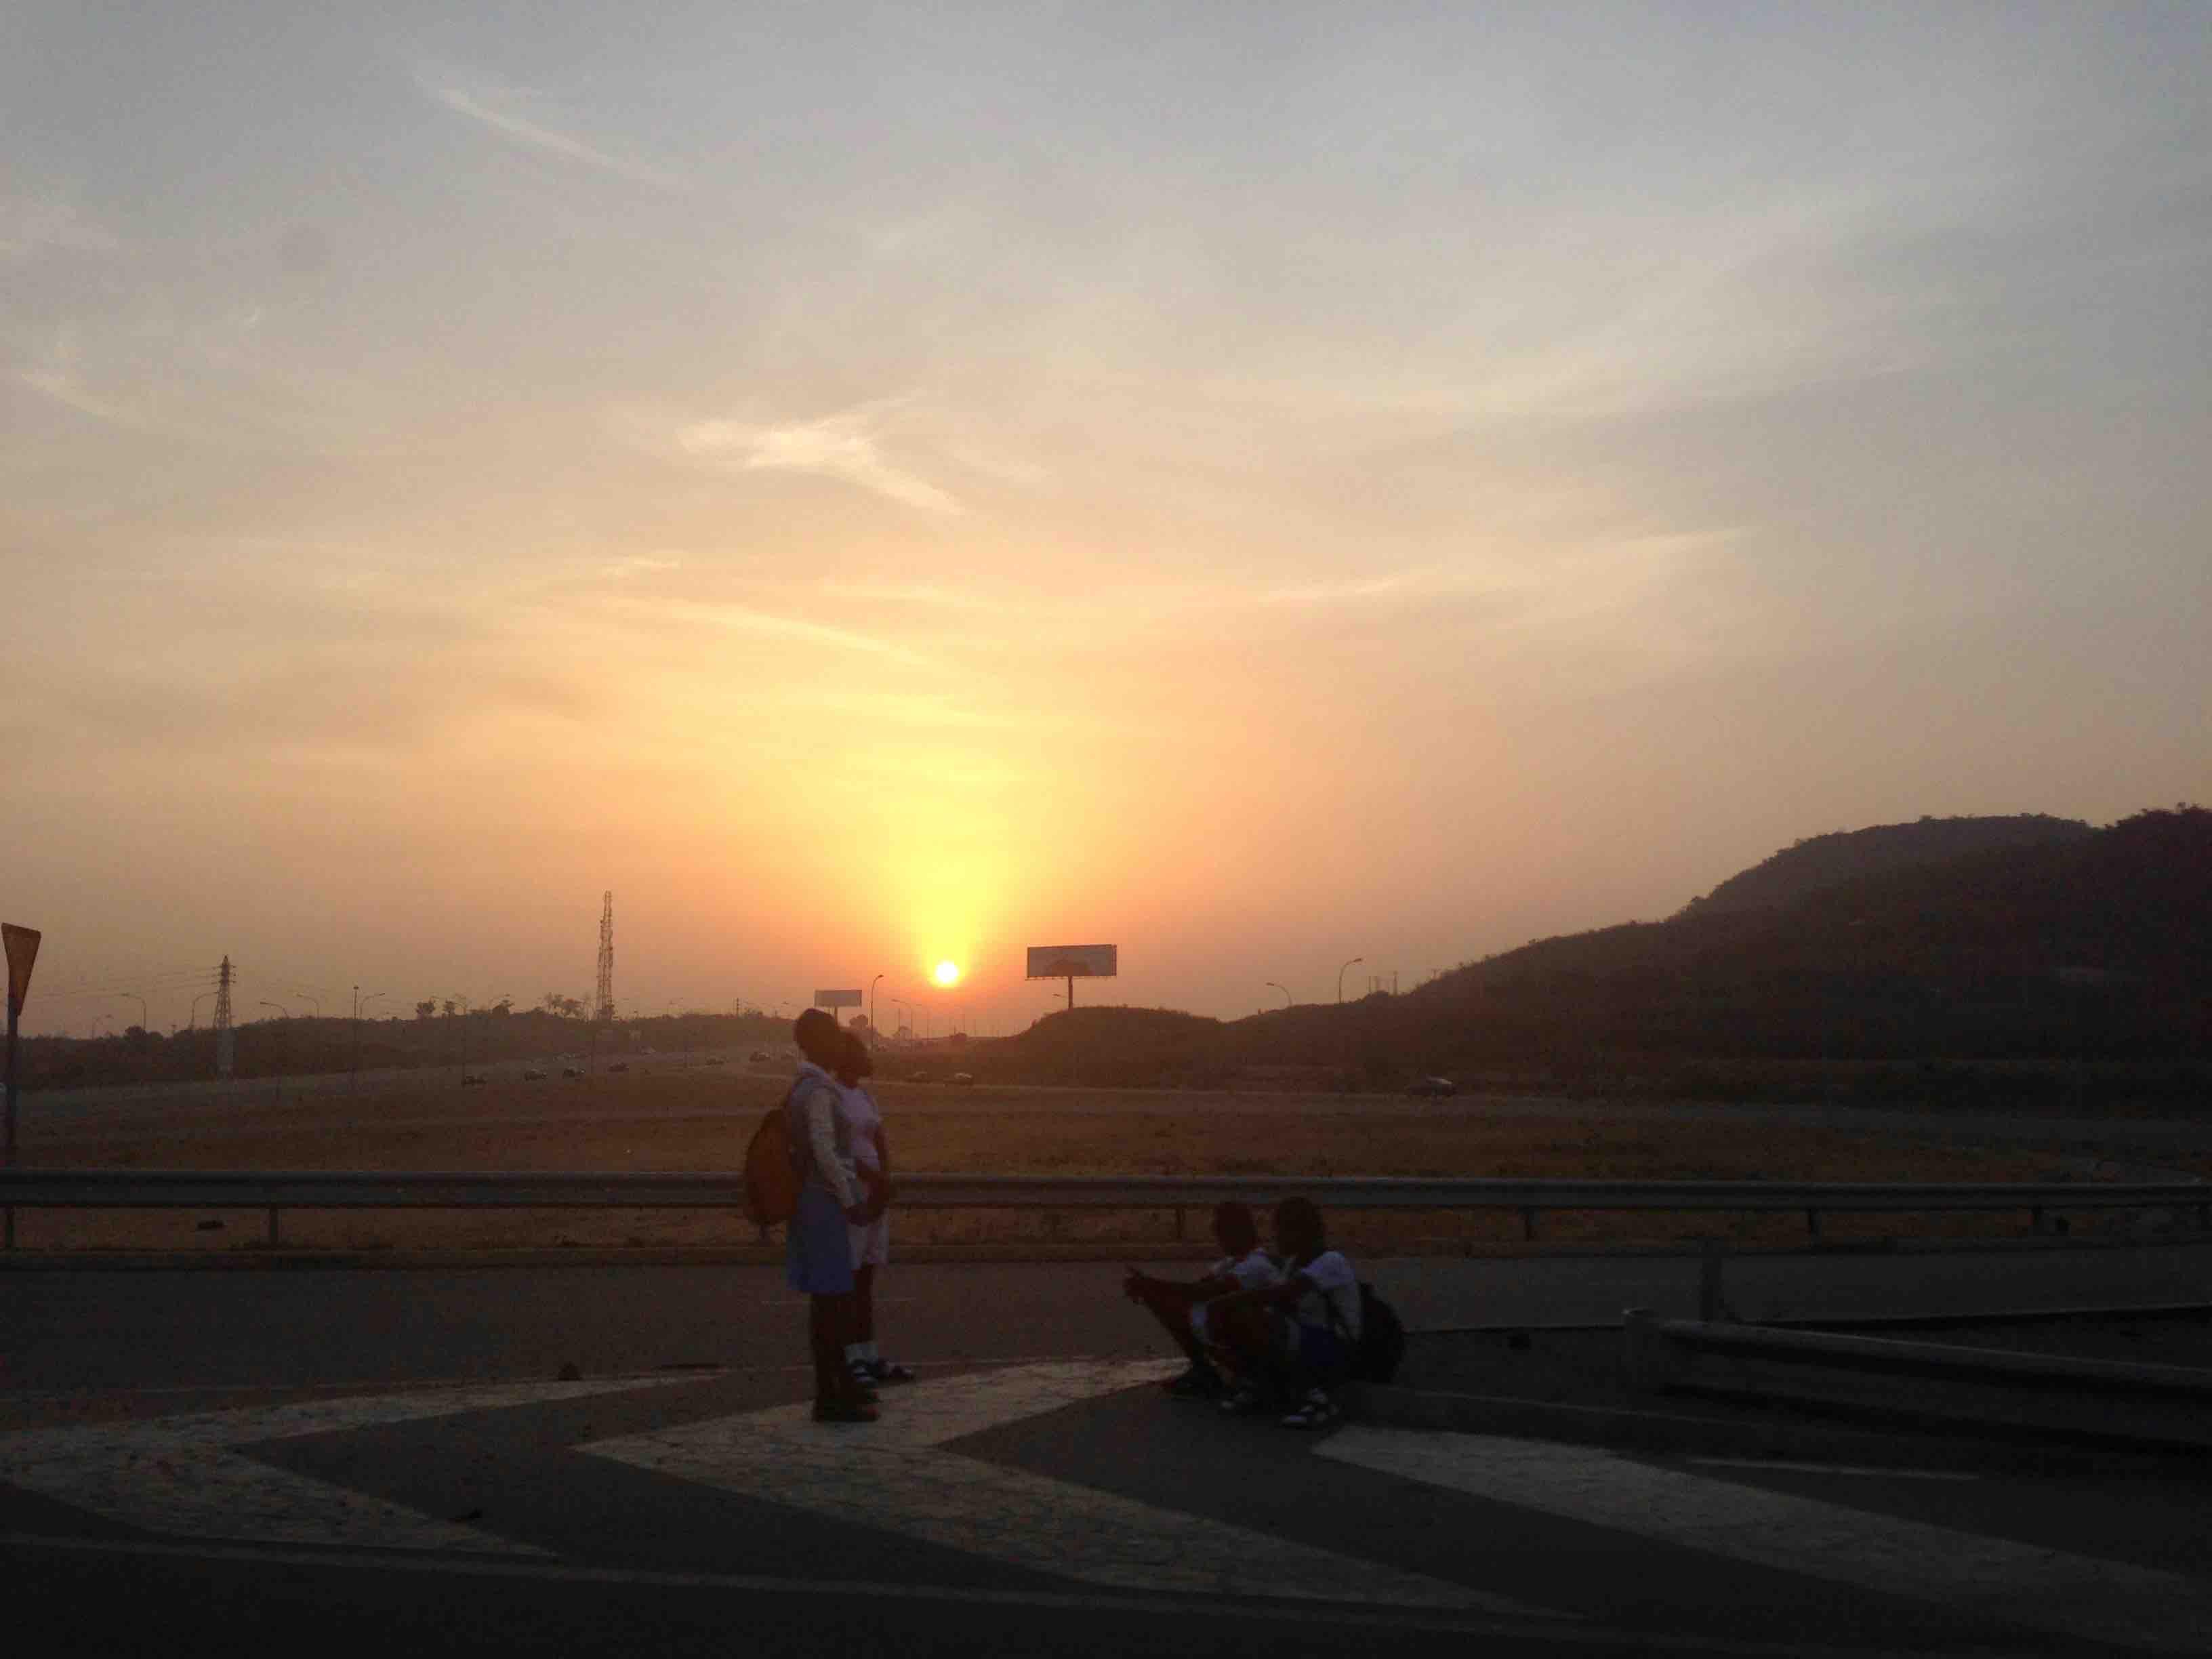 Sunrise over Abuja, Nigeria. #JujuFilms